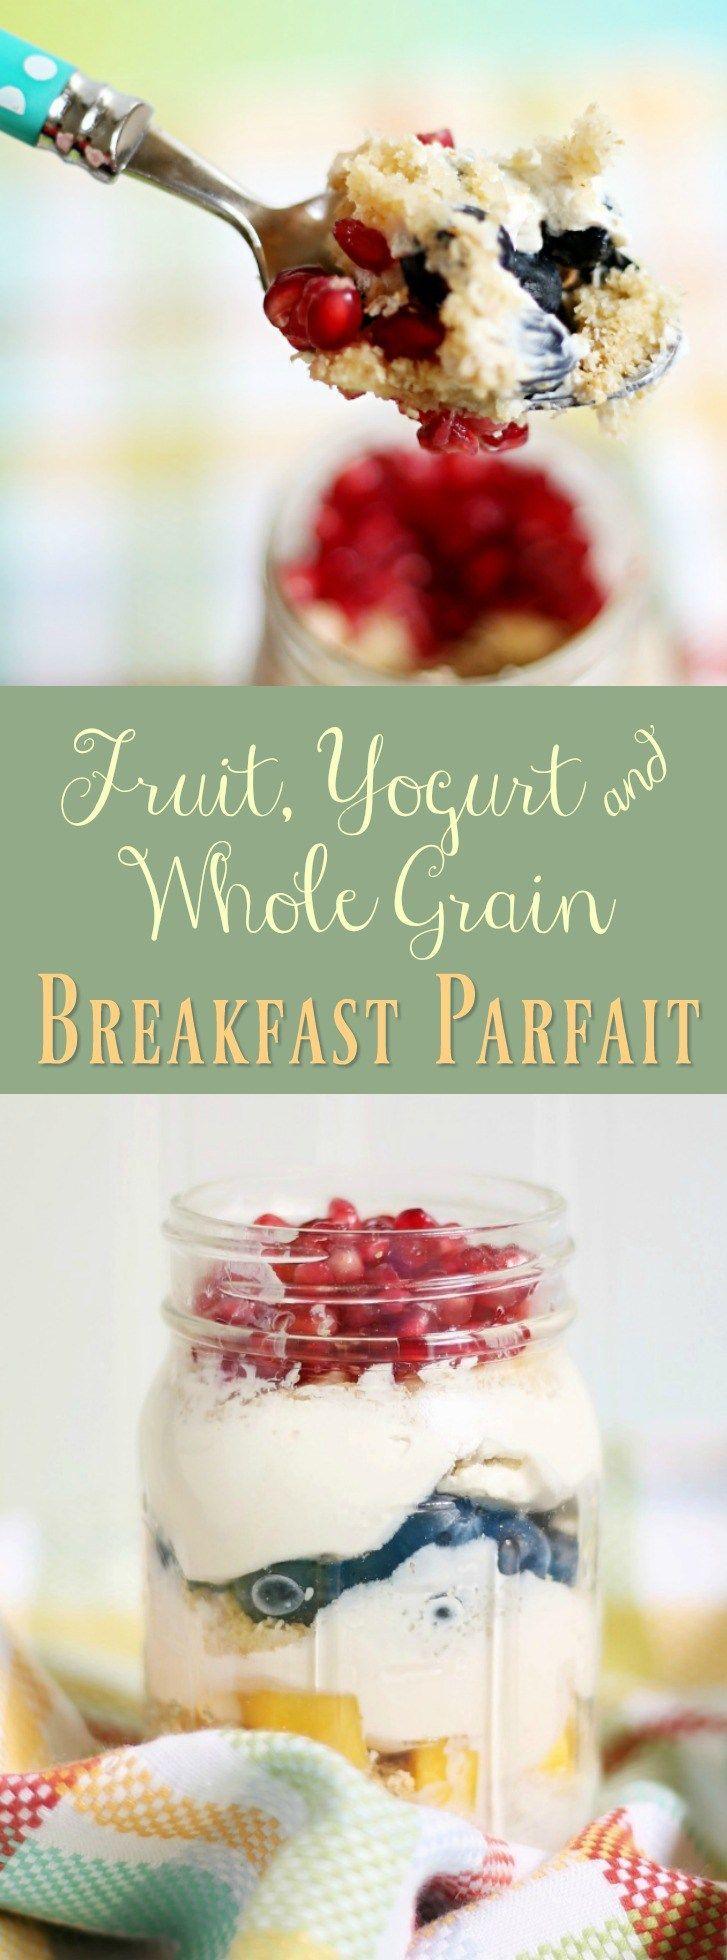 Fruit, Yogurt, & whole grain breakfast parfait recipe. #spoonfulsofgoodness (AD) -- Get a Post:registered: cereal coupon here: ooh.li/1369266